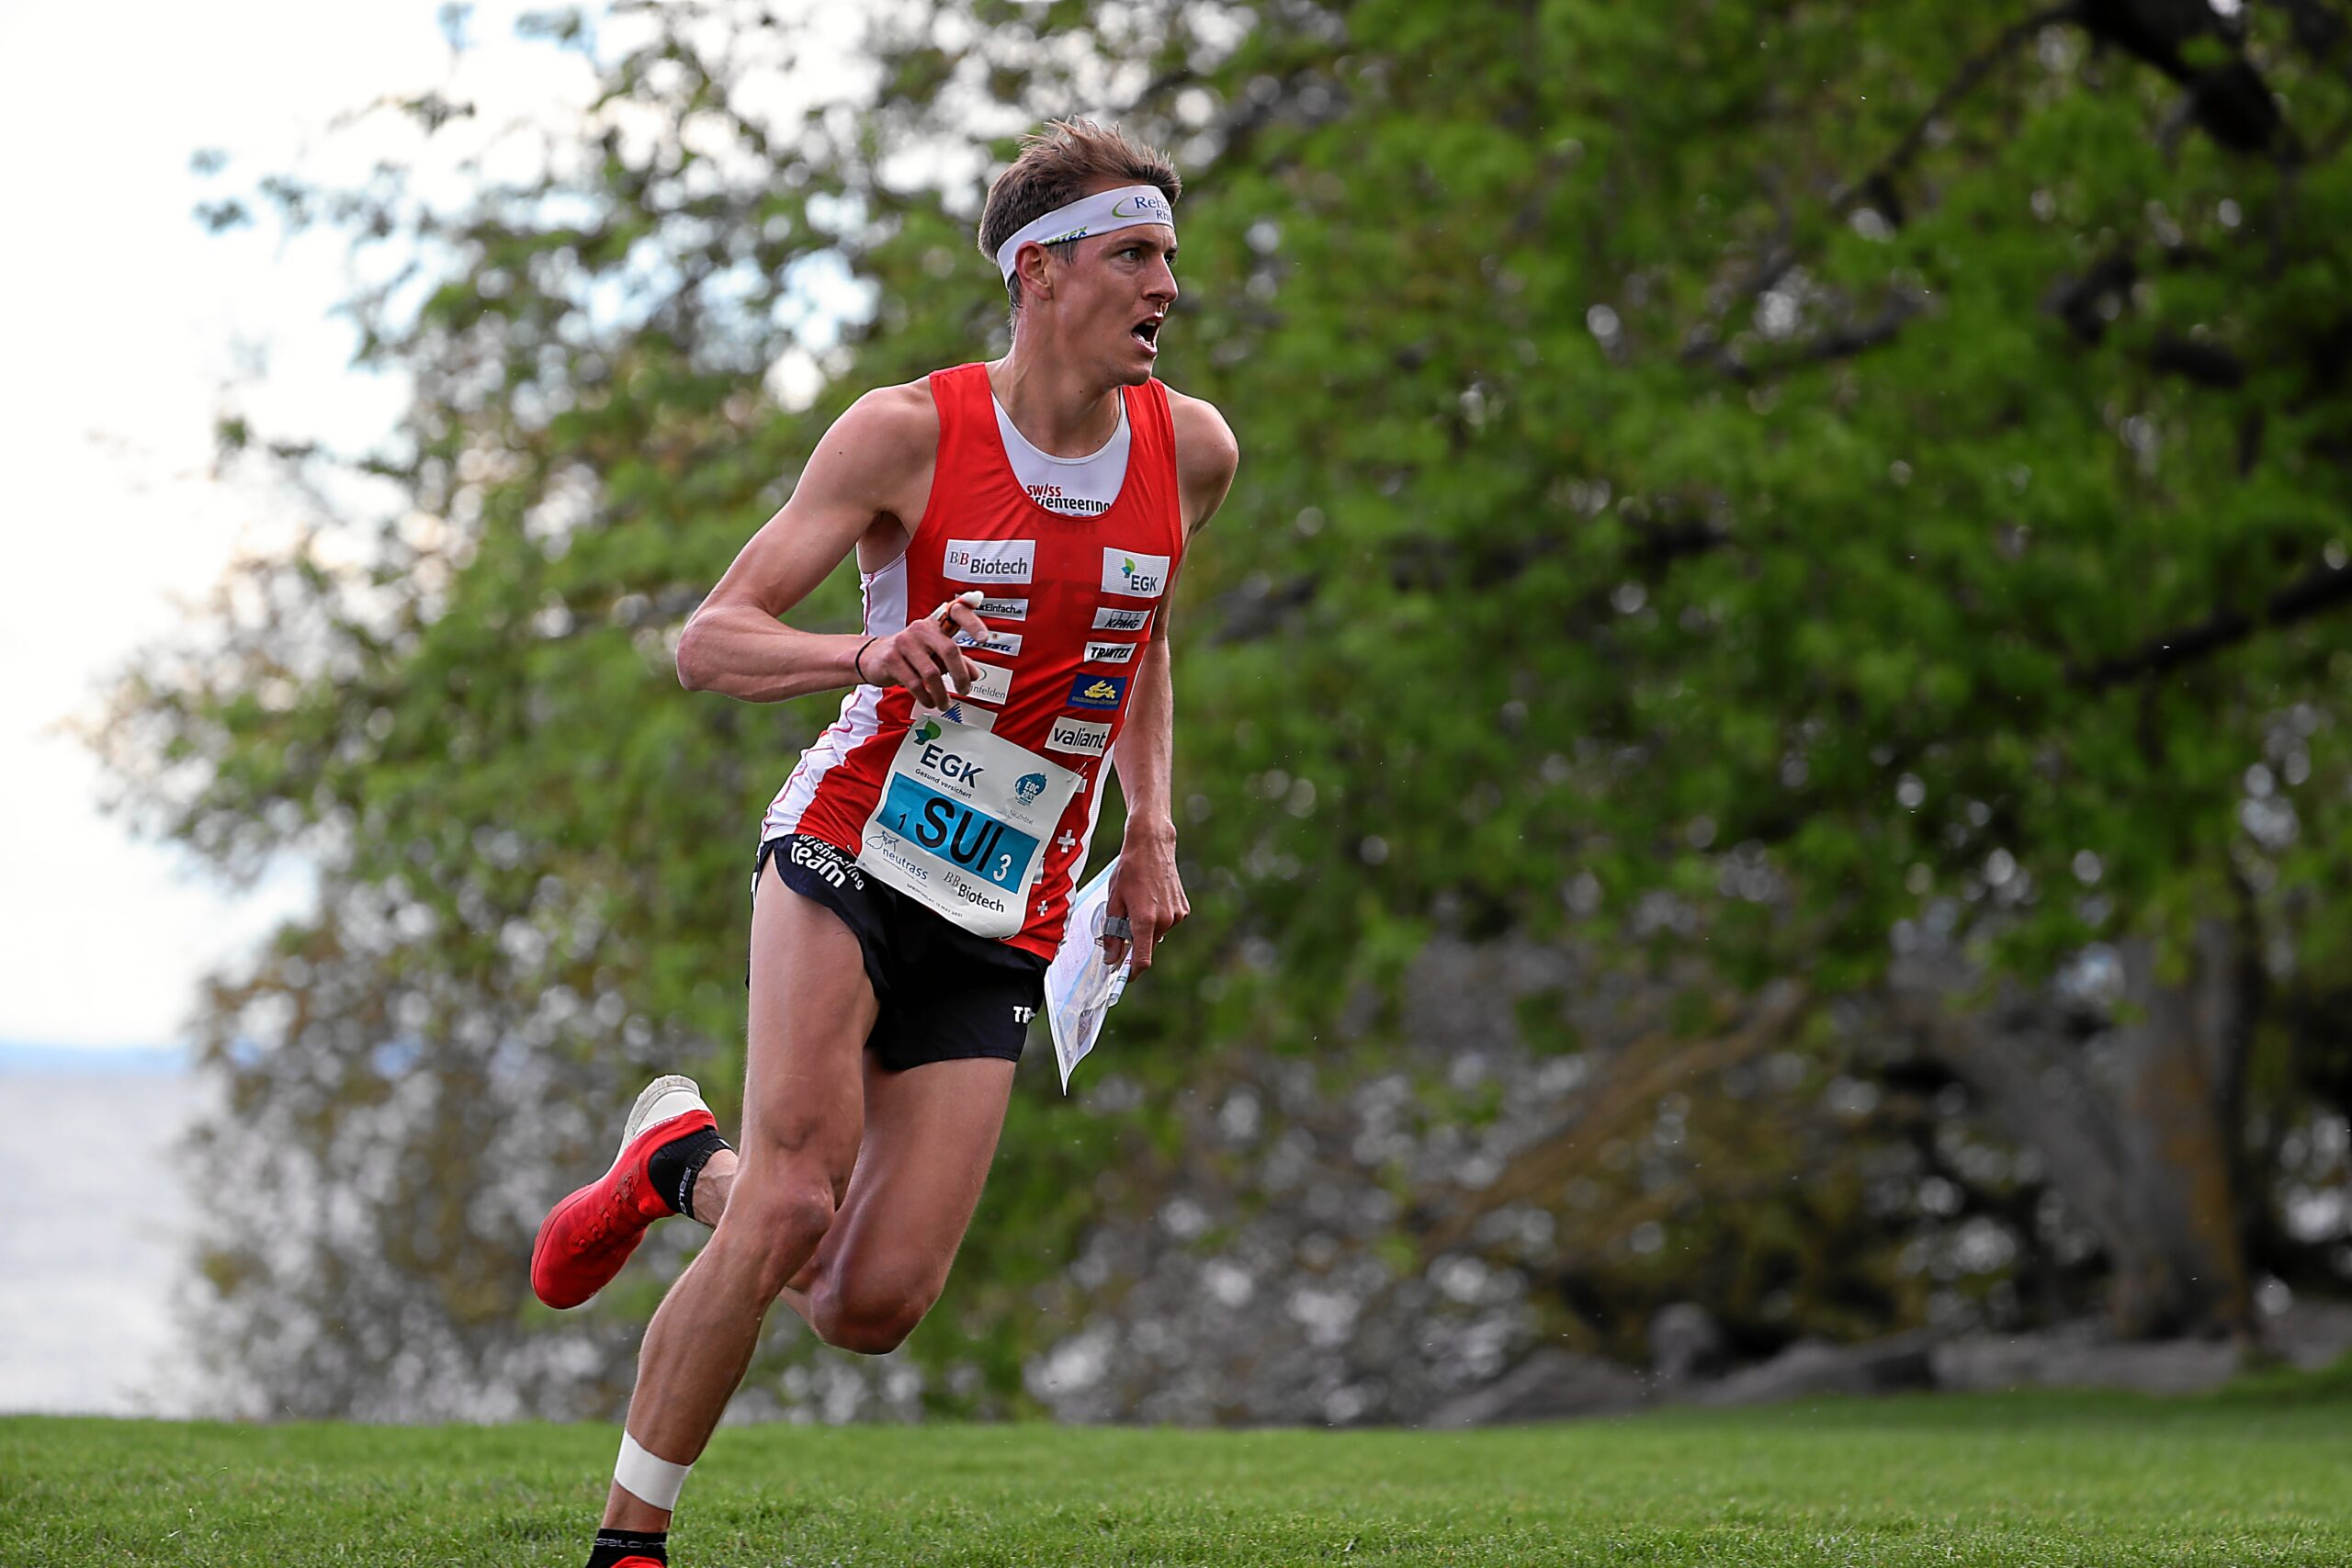 EOC 2021 Neuchatel. Mixed Sprint Relay – Matthias Kyburz (Switzerland)